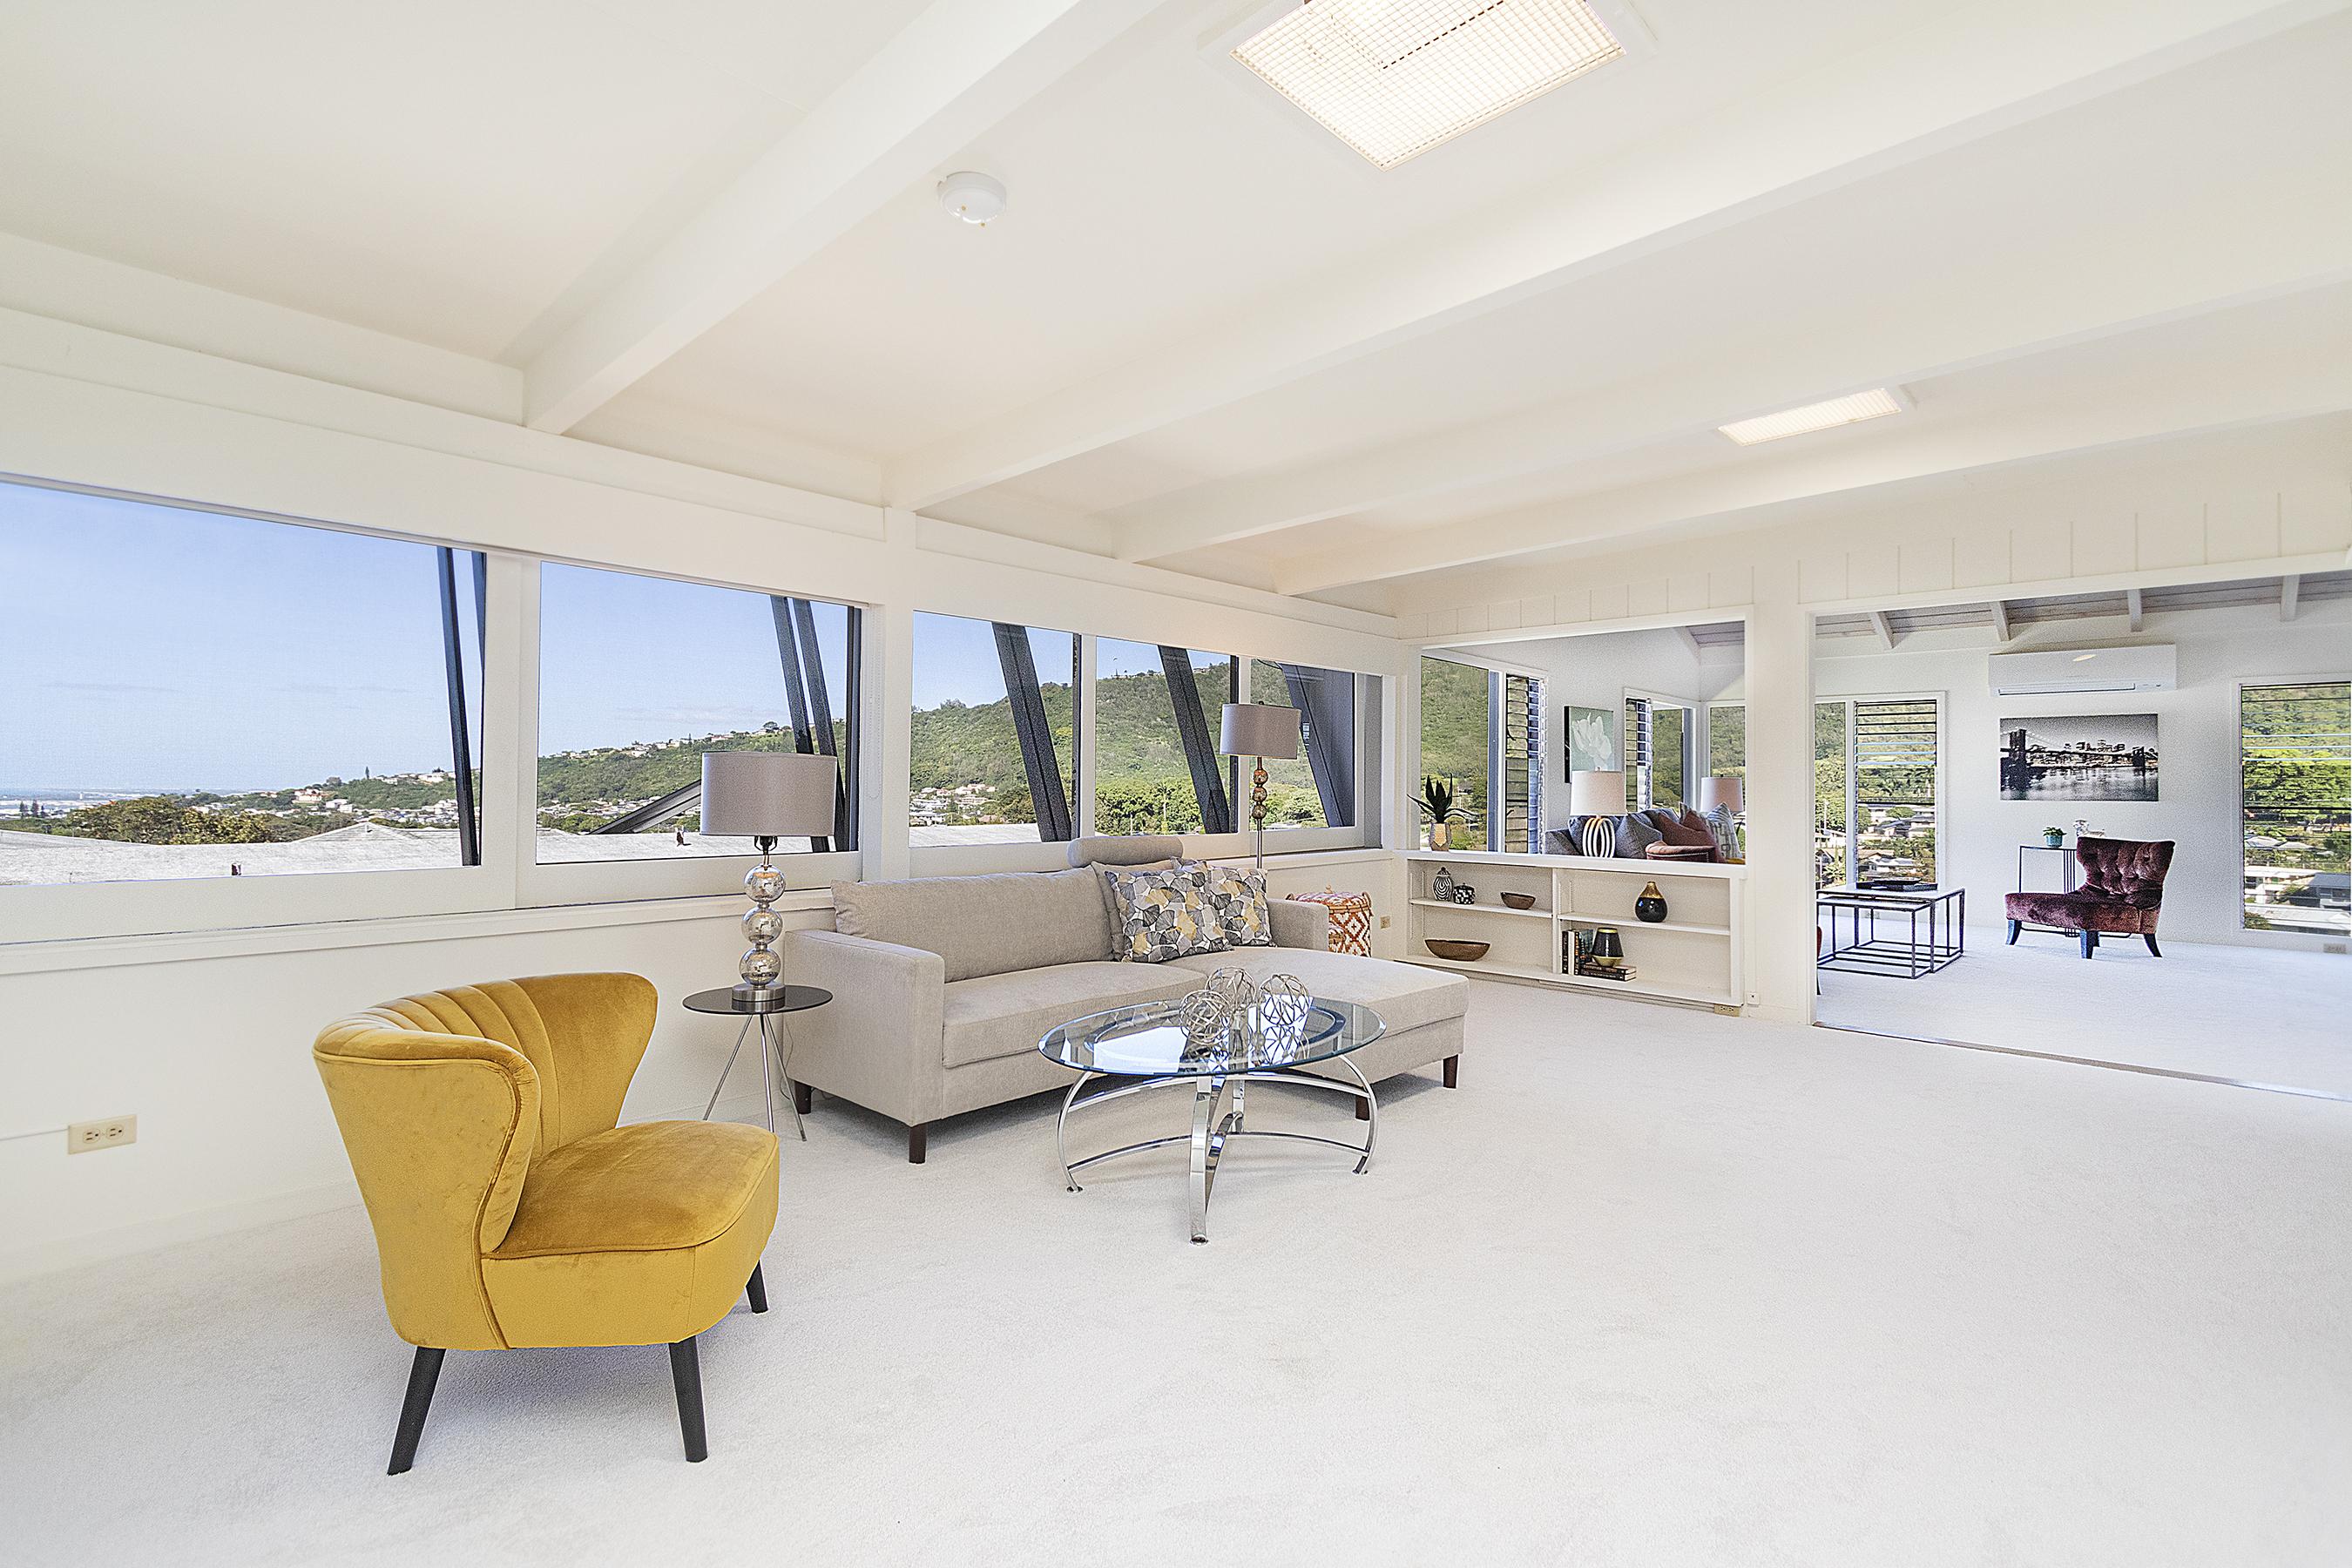 Family Room at 380 Puiwa Road, Honolulu, HI 96817